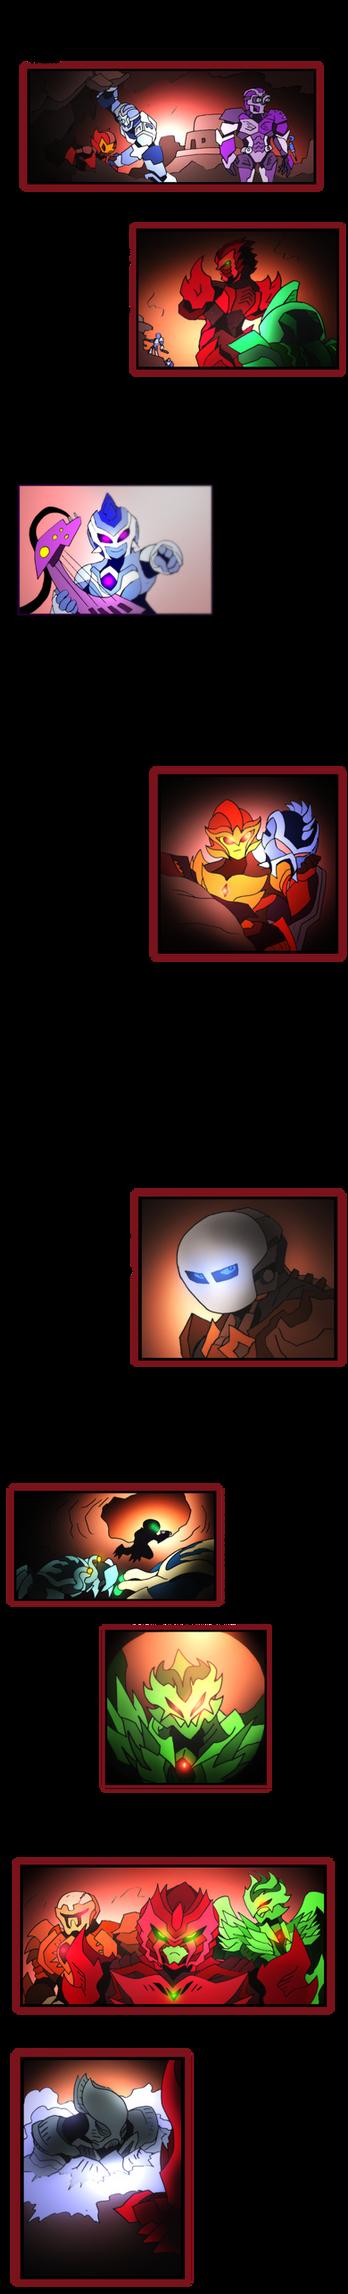 Bionicle- Nova Orbis- Return- Chapter 7